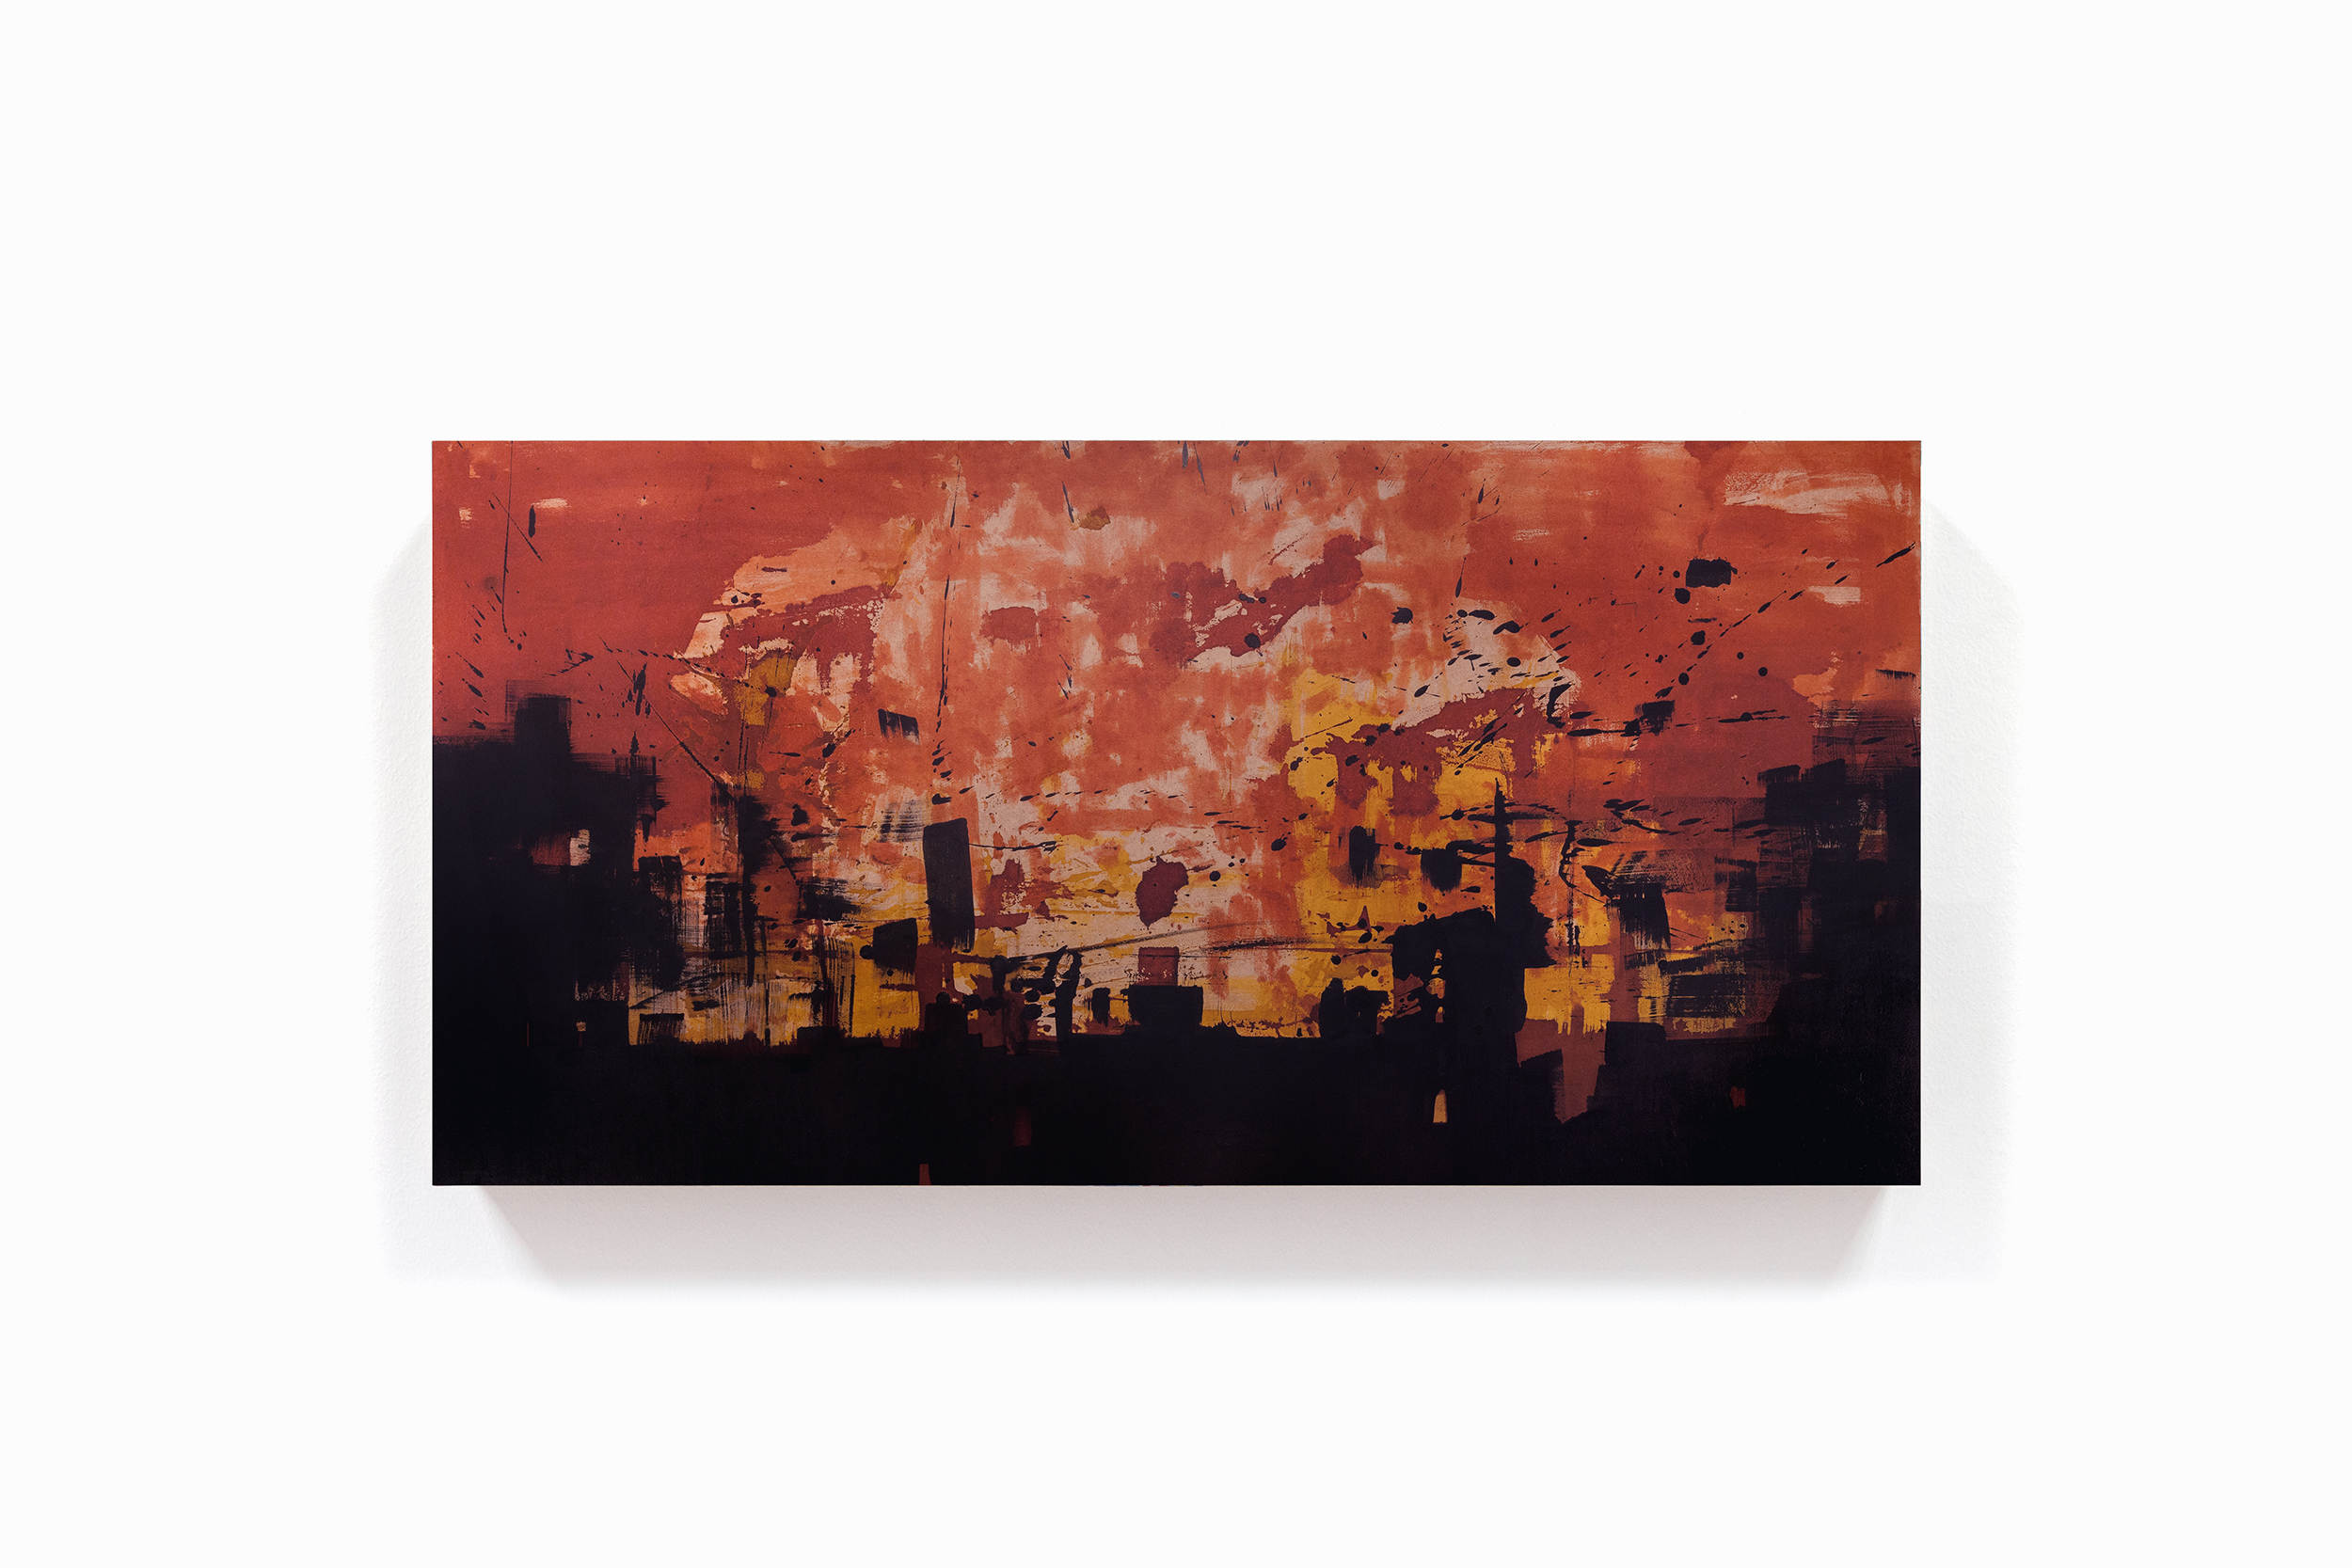 114 Andre Gigante Pintura Painting bonjourmolotov La.jpg